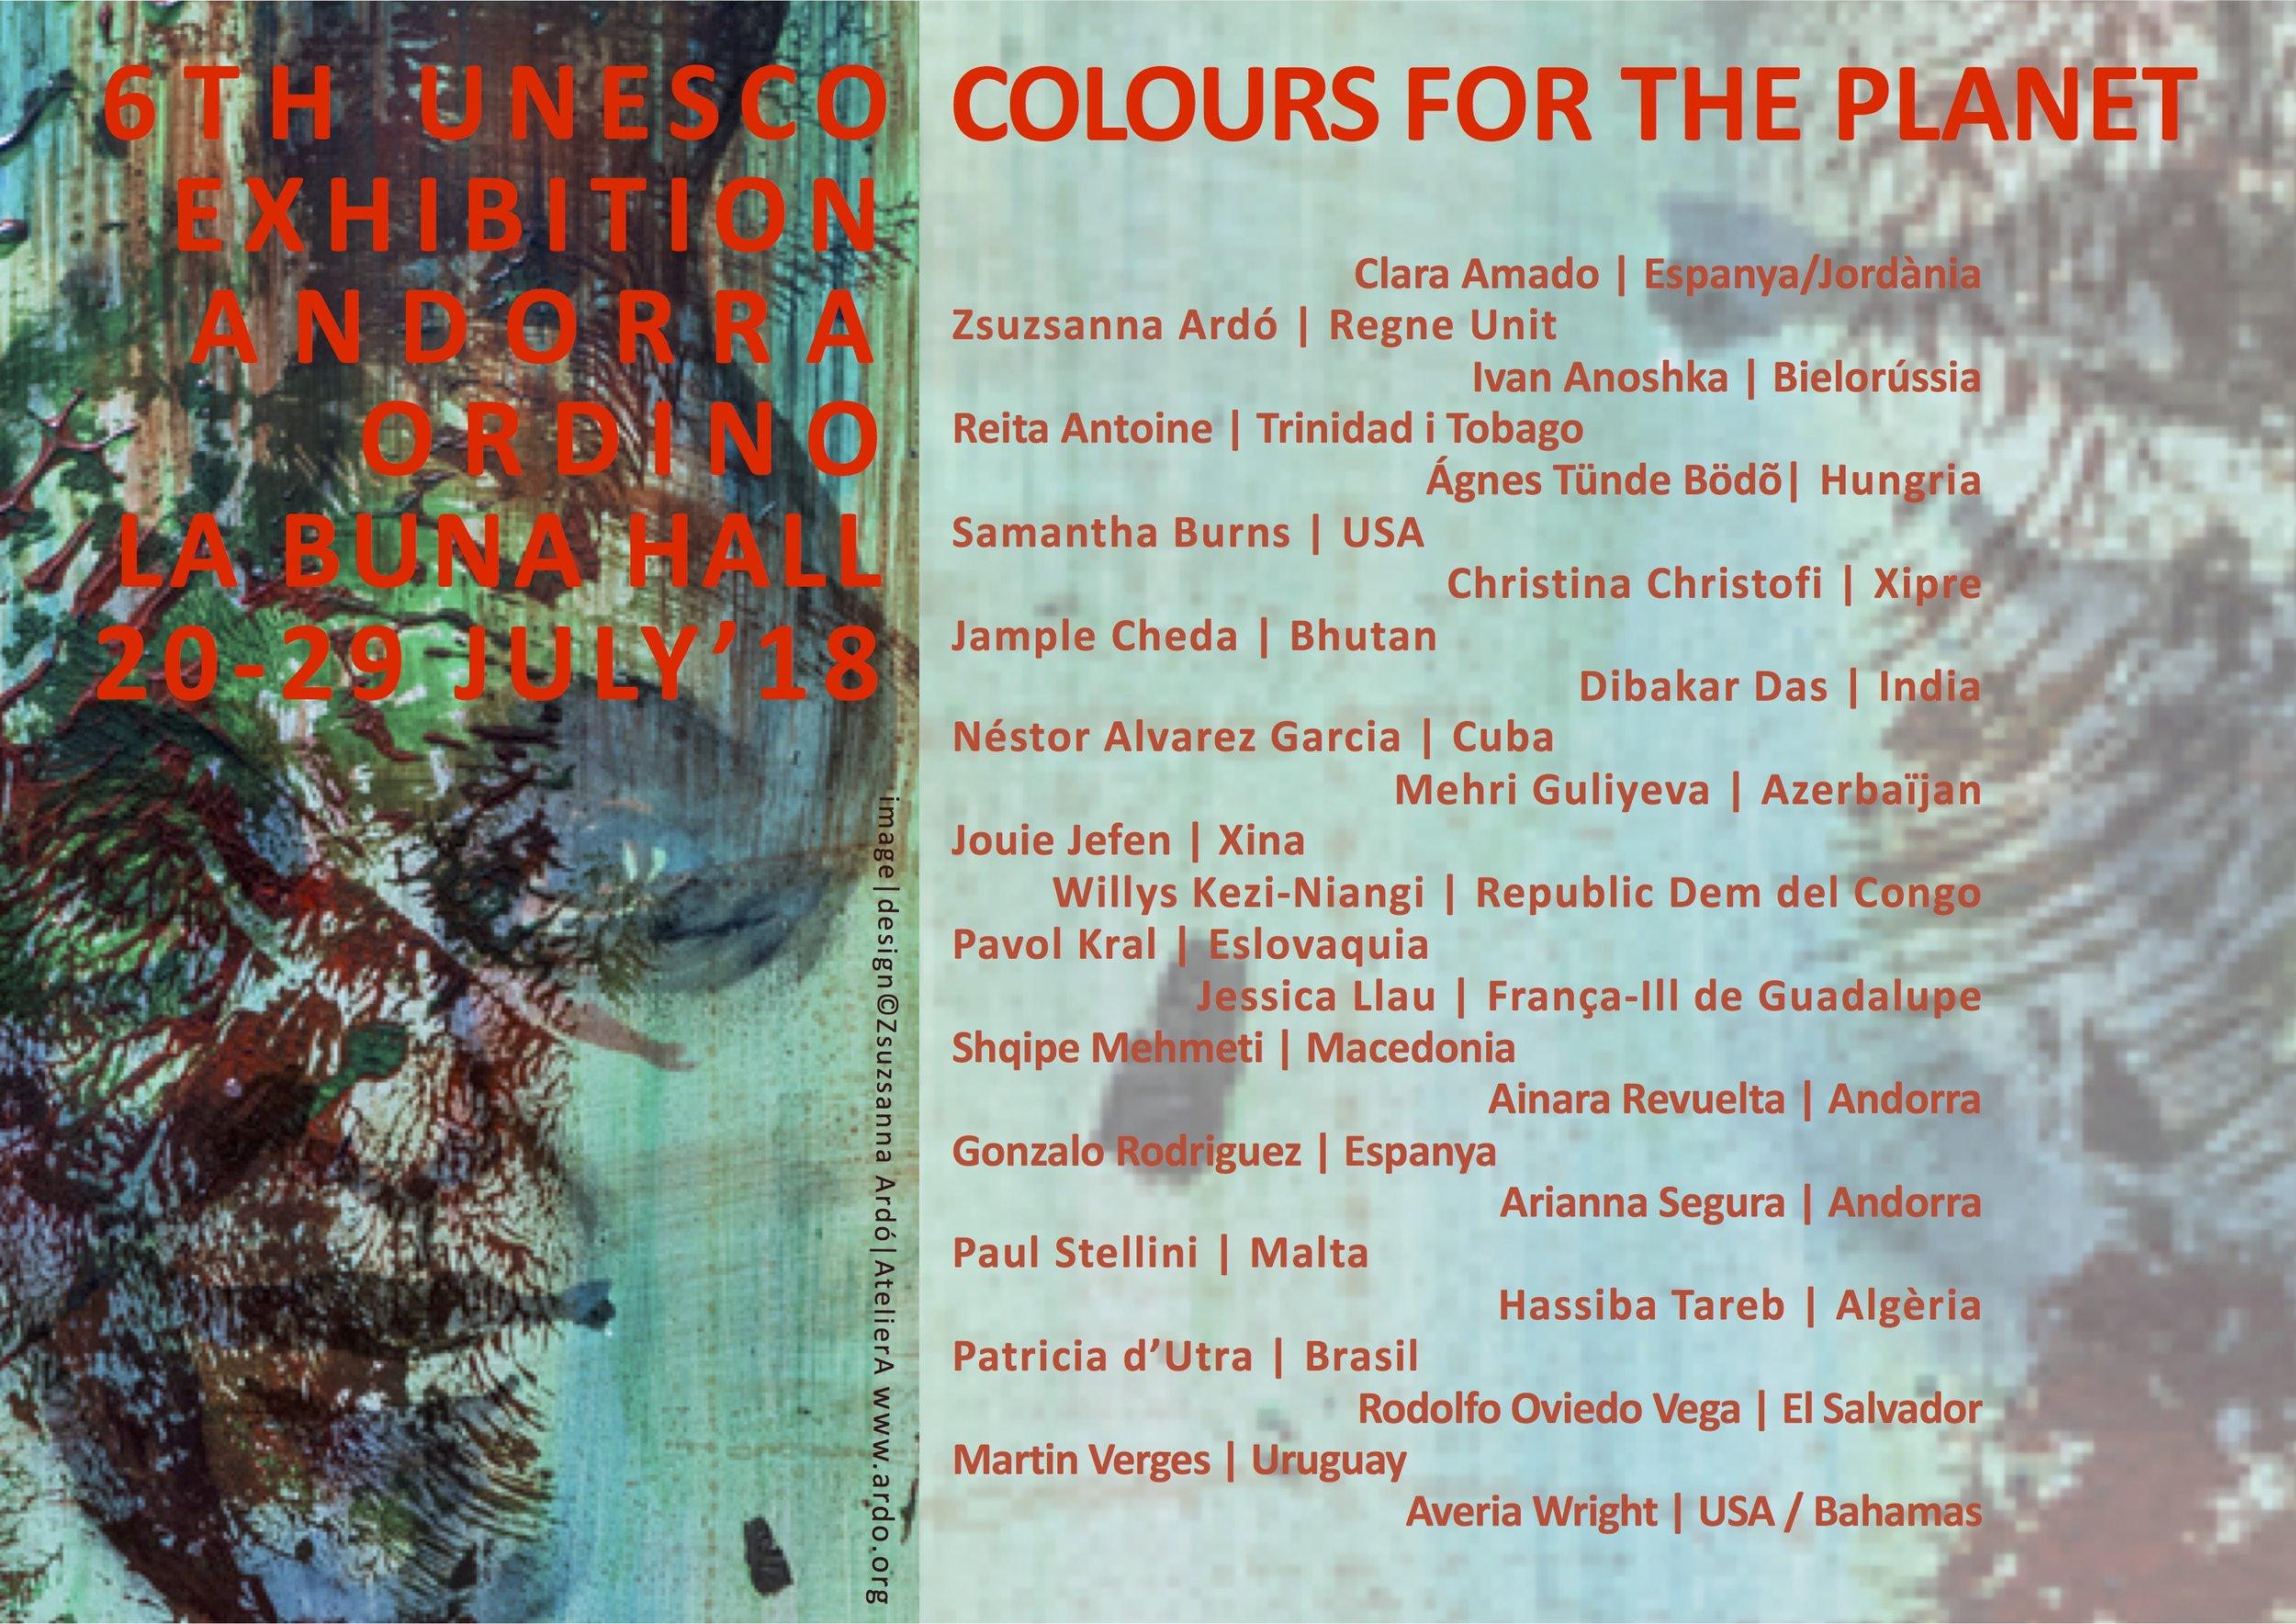 18 Andorra UNESCO Exhibition 20-29 July 2018 poster w ARTISTS©Zsuzsanna Ardó.jpg